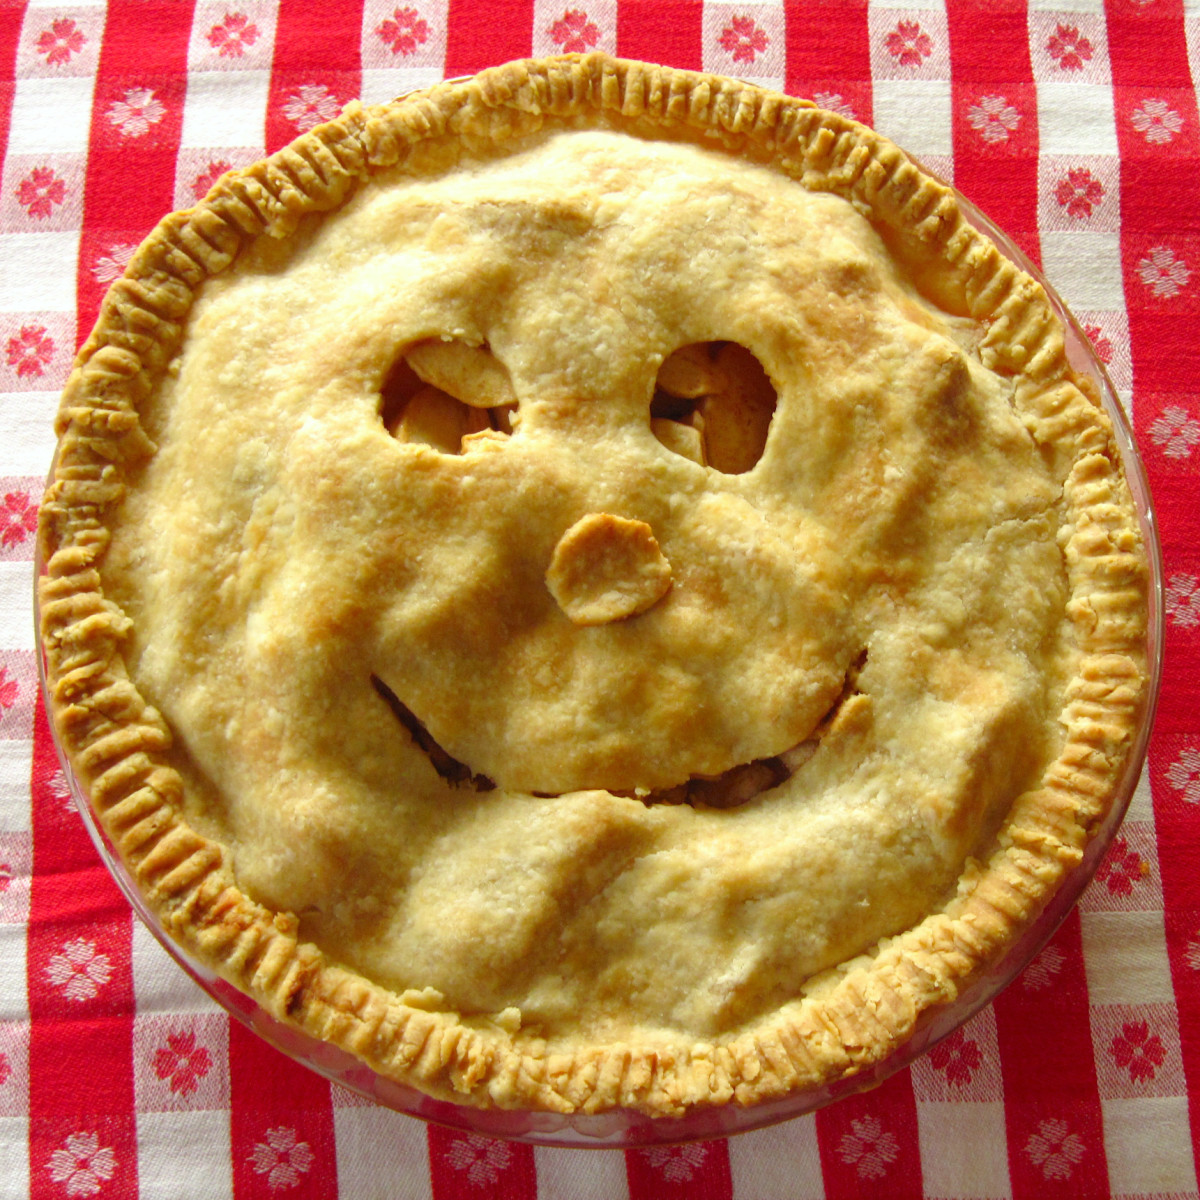 Enjoy this musical pie lesson!